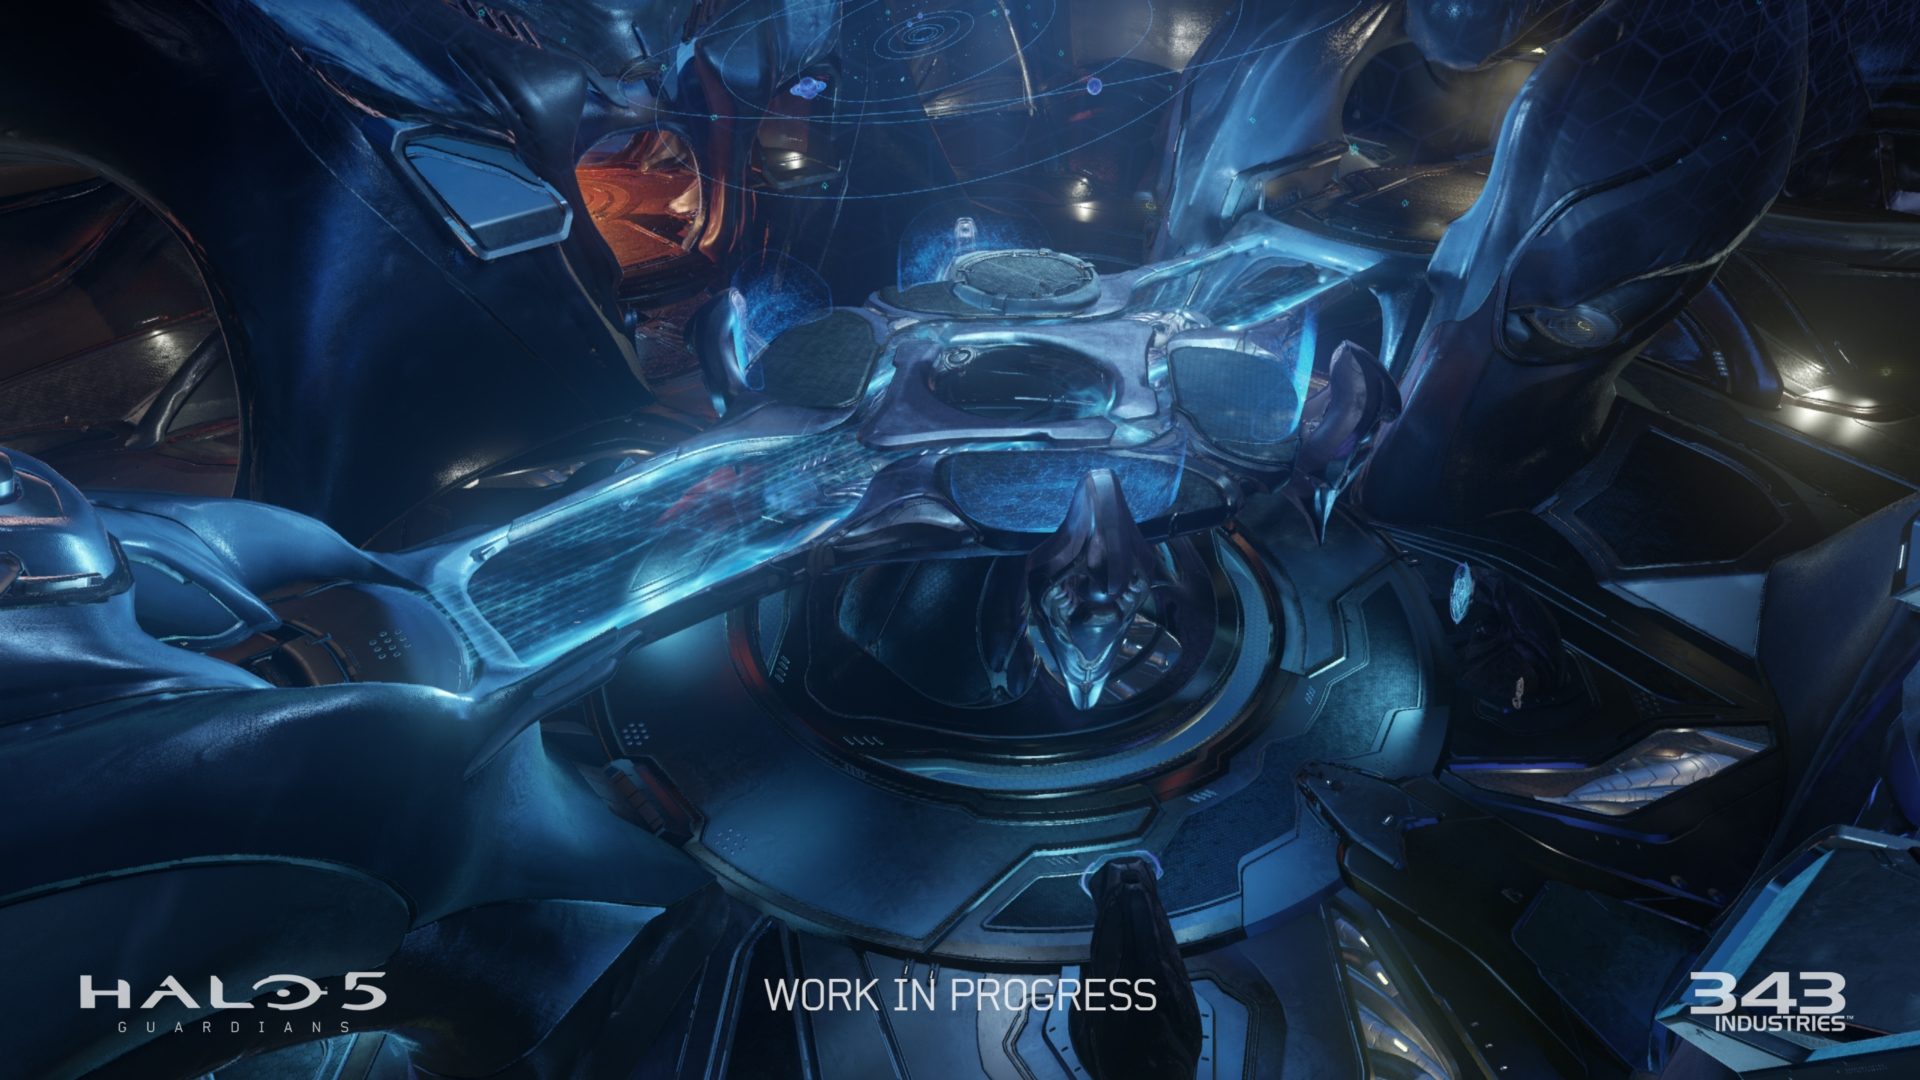 48+] Halo 5 Official Wallpaper on WallpaperSafari